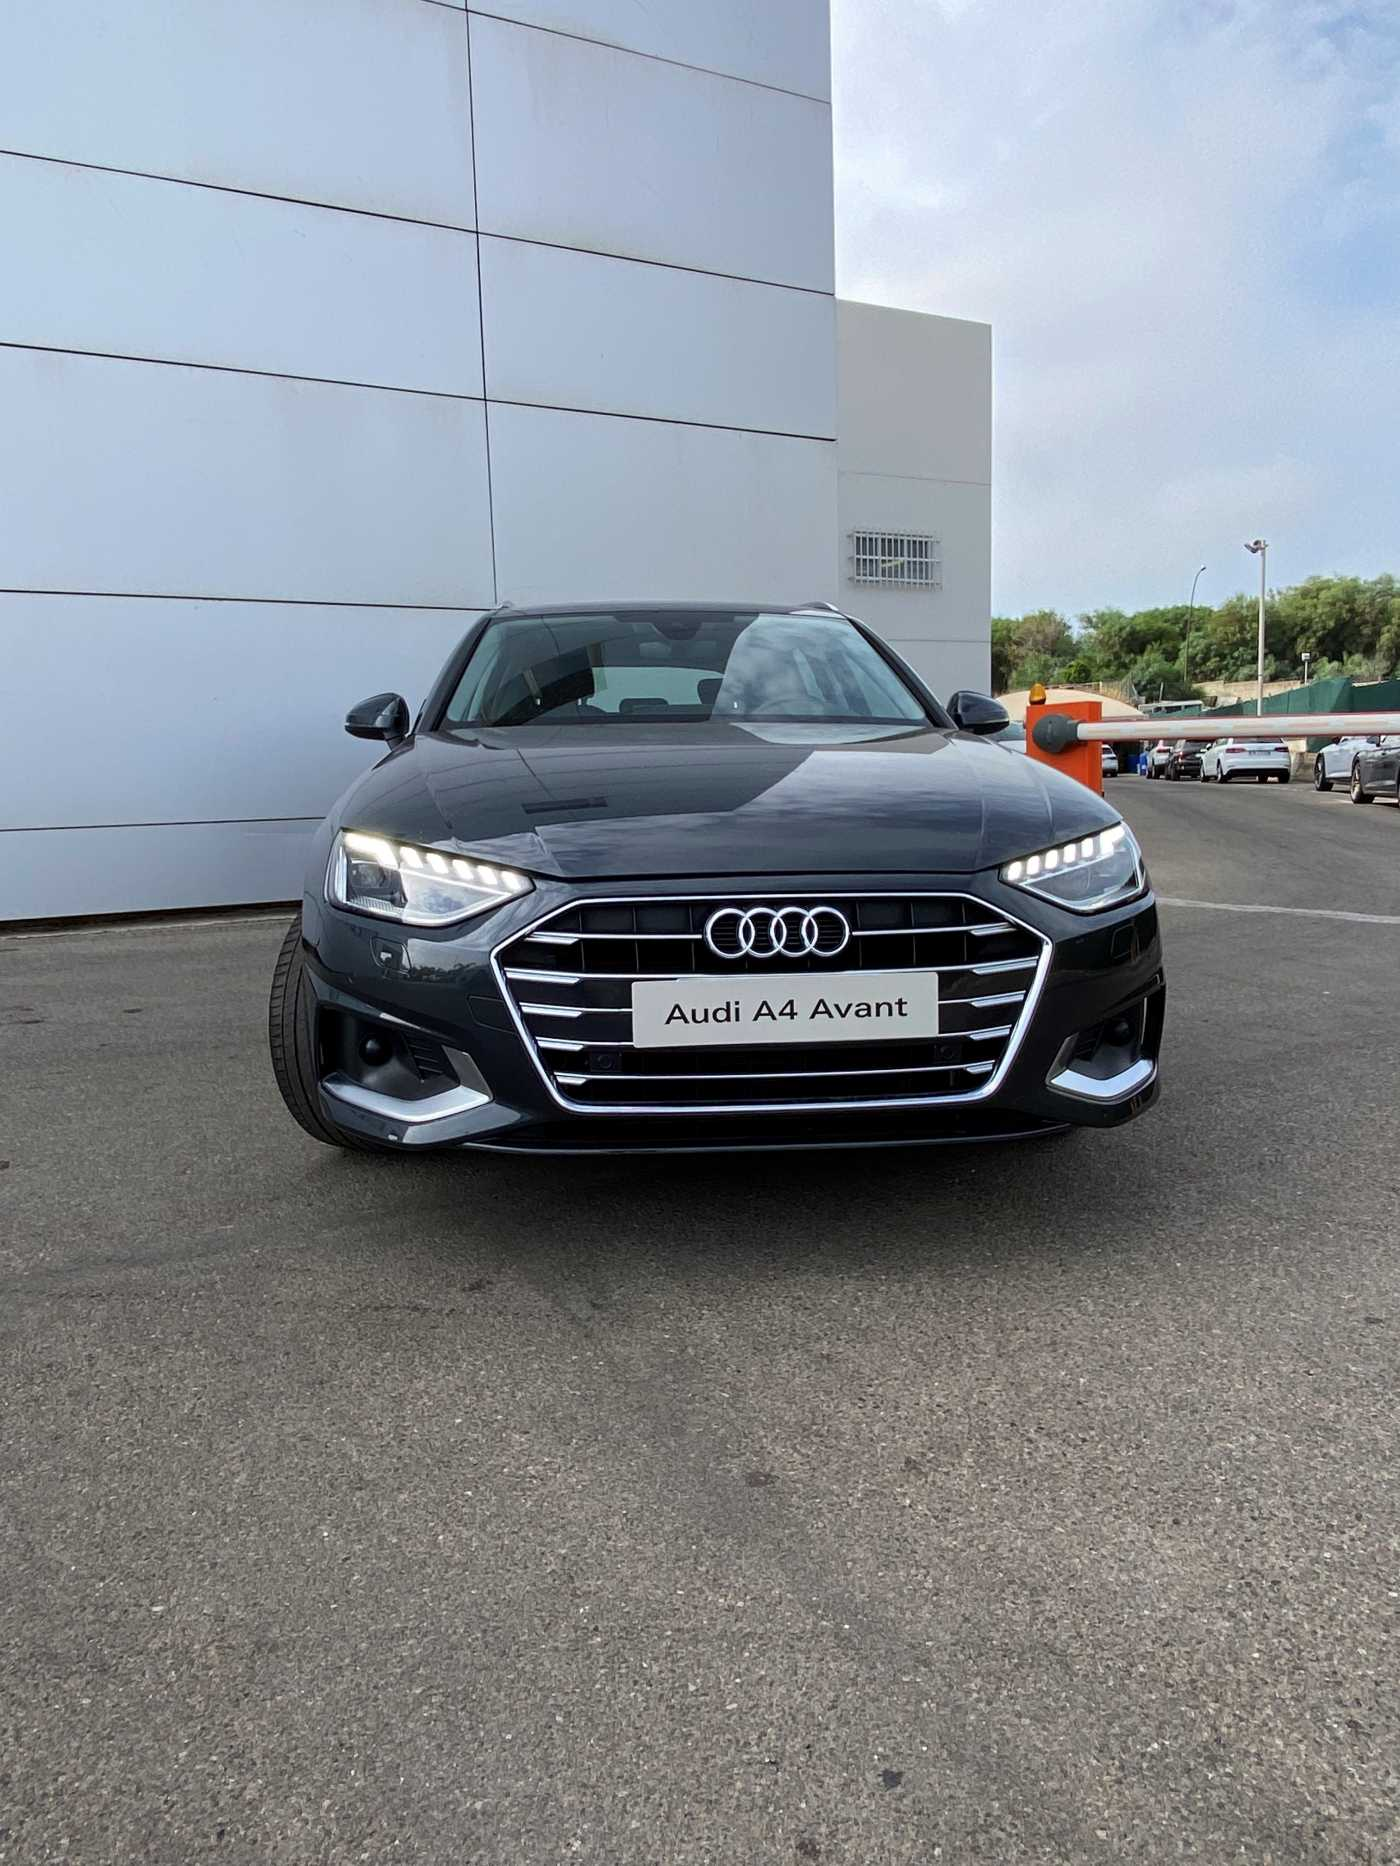 Audi - A4 5ª serie usata in Sardegna - Concessionaria ufficiale Audi Catte Auto Cagliari